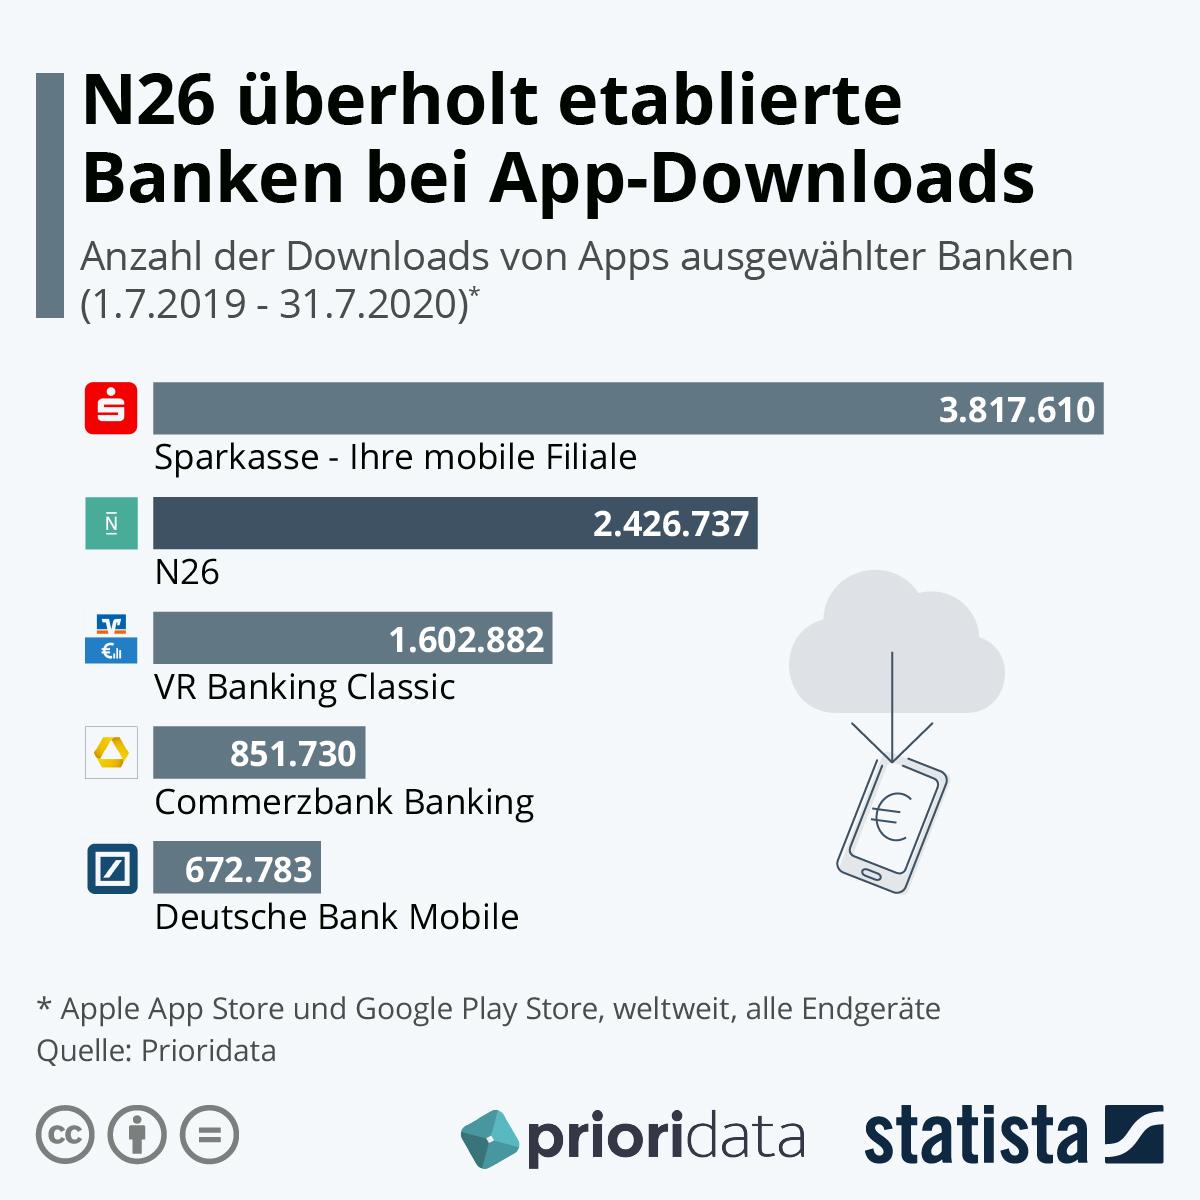 Infografik: N26 überholt etablierte Banken bei App-Downloads | Statista